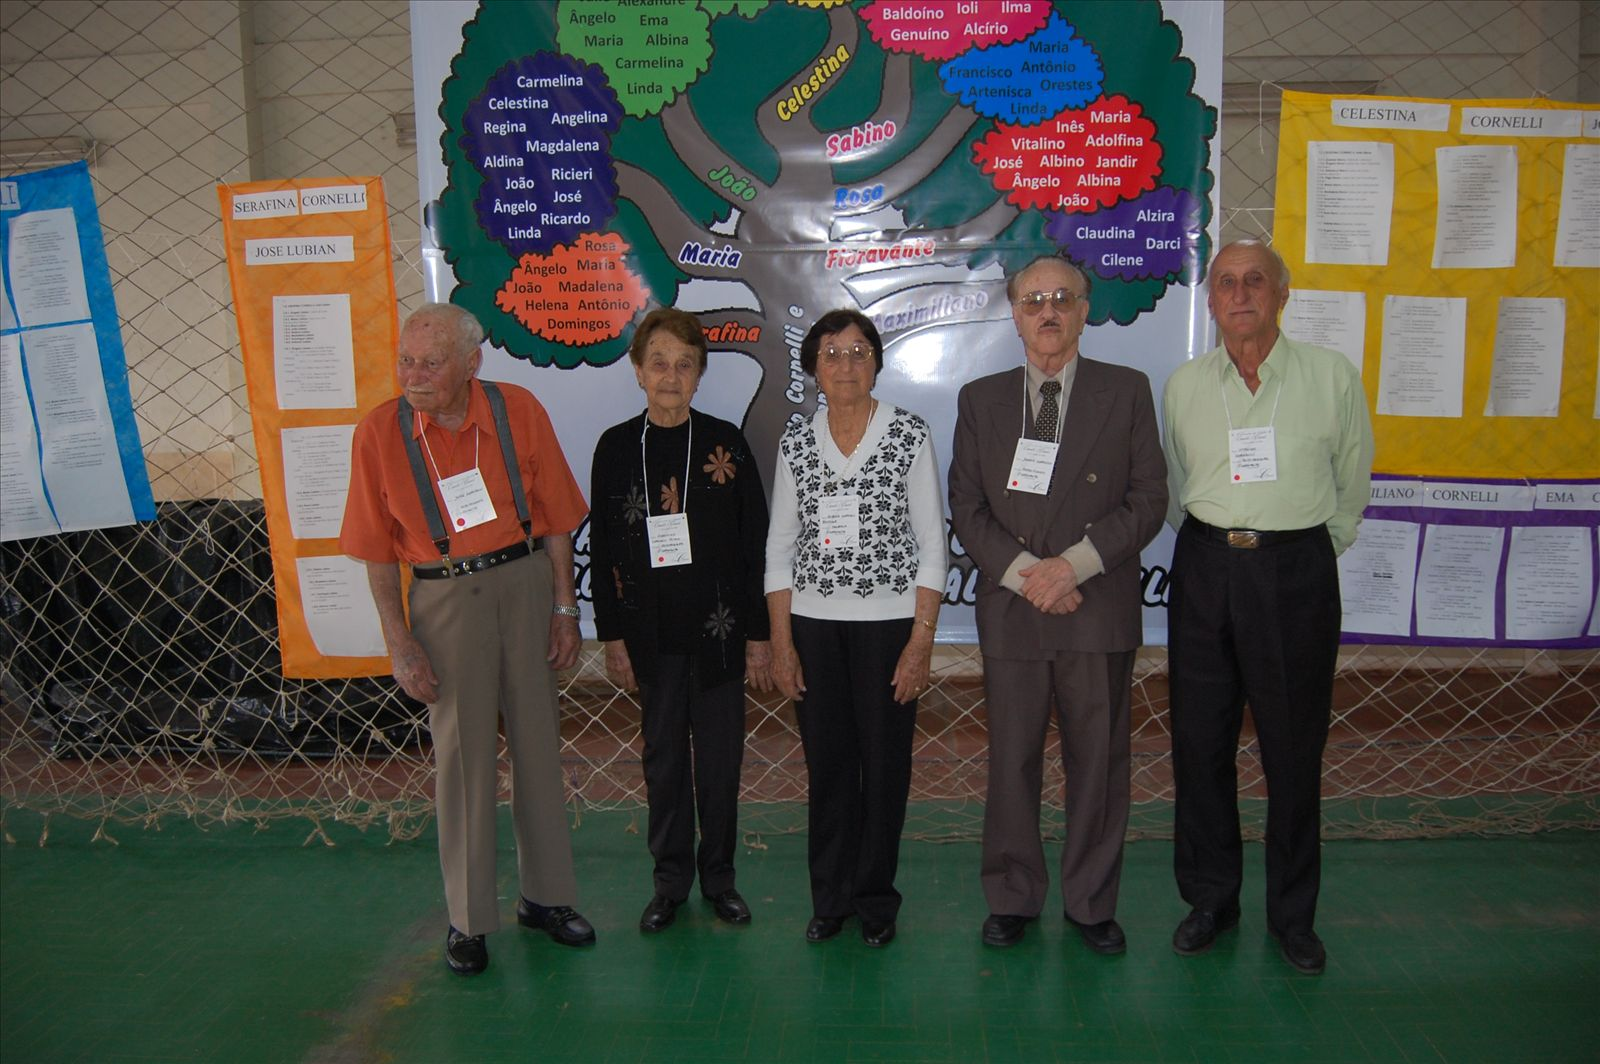 2º Encontro Família Cornelli - 11.10.2009 (198)_0